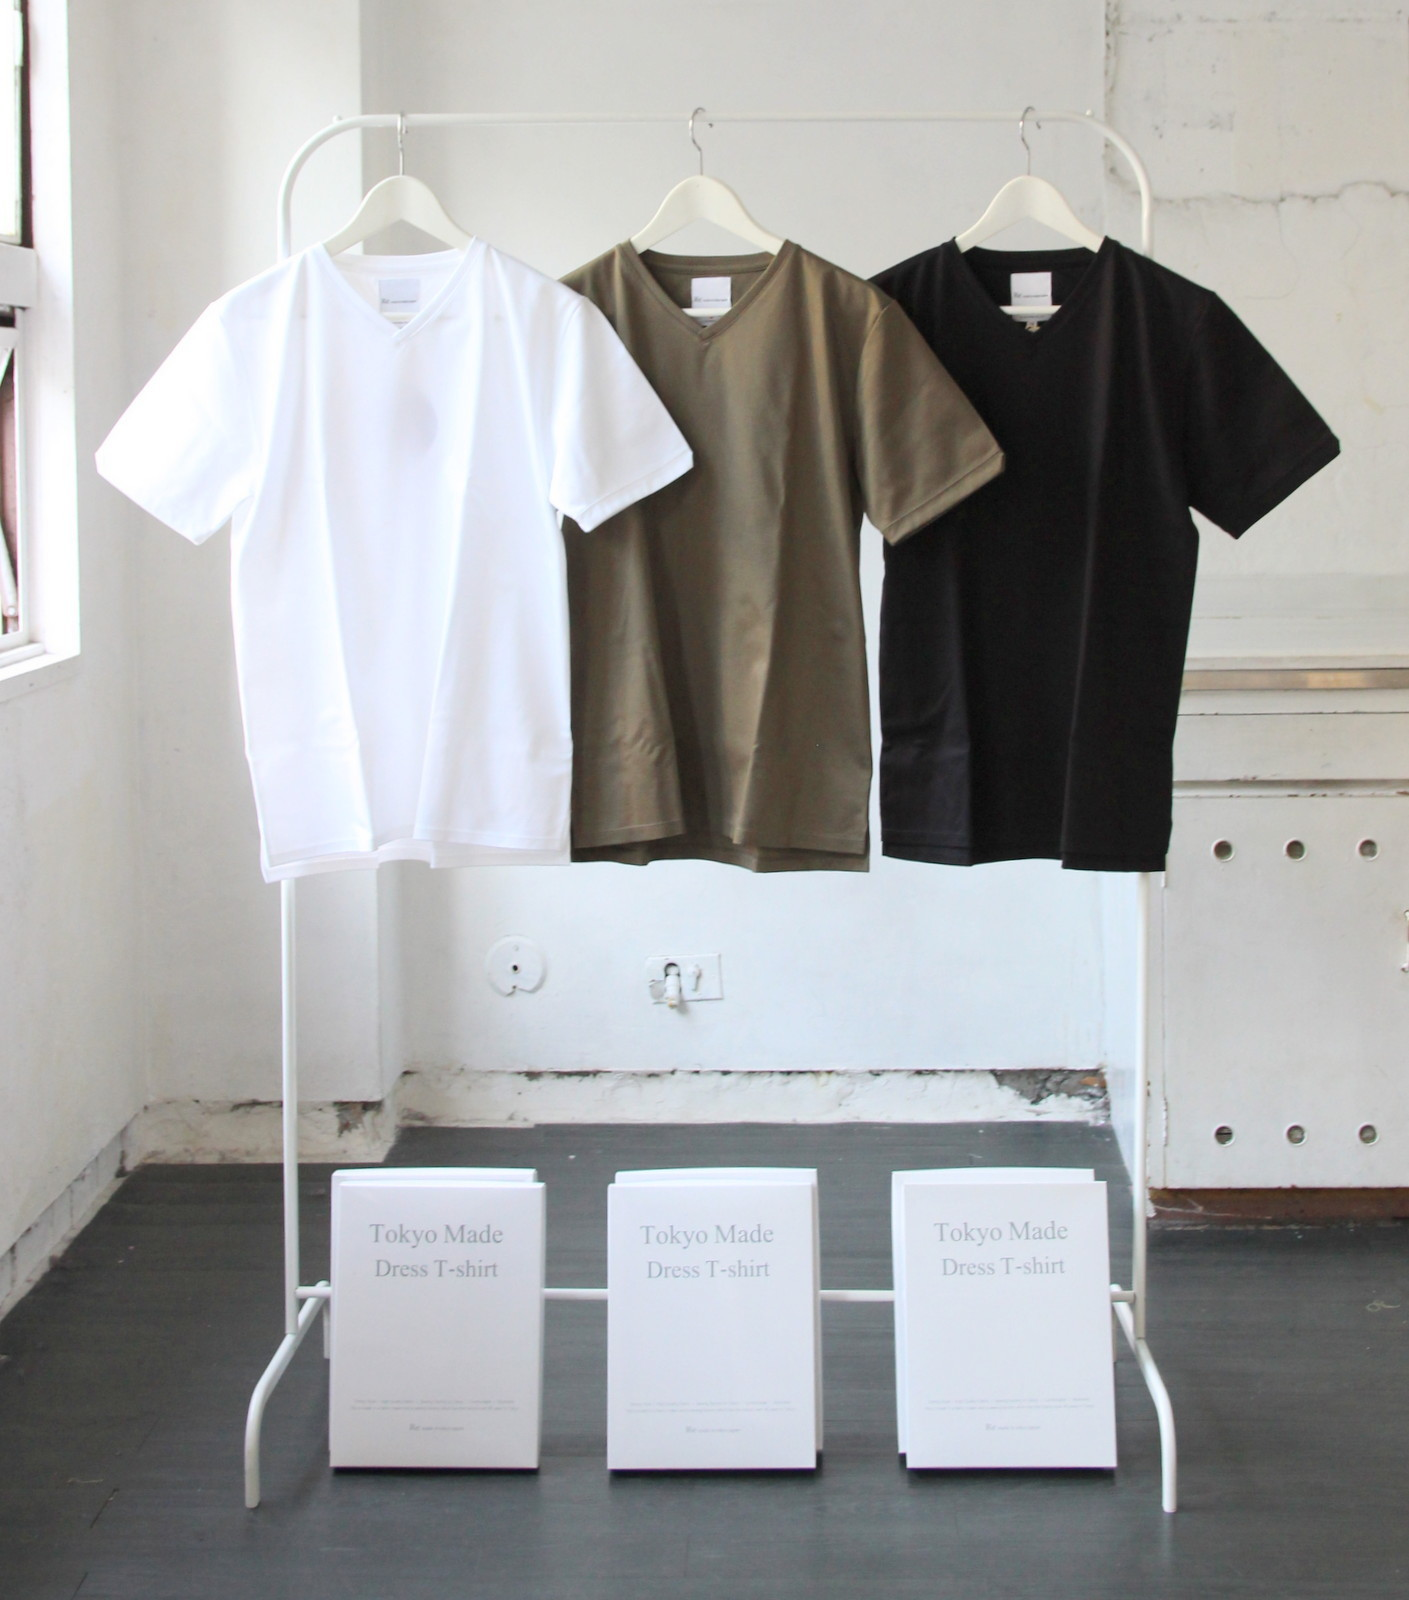 Tokyo Made Dress T-shirt (V-neck)_c0379477_07272680.jpg